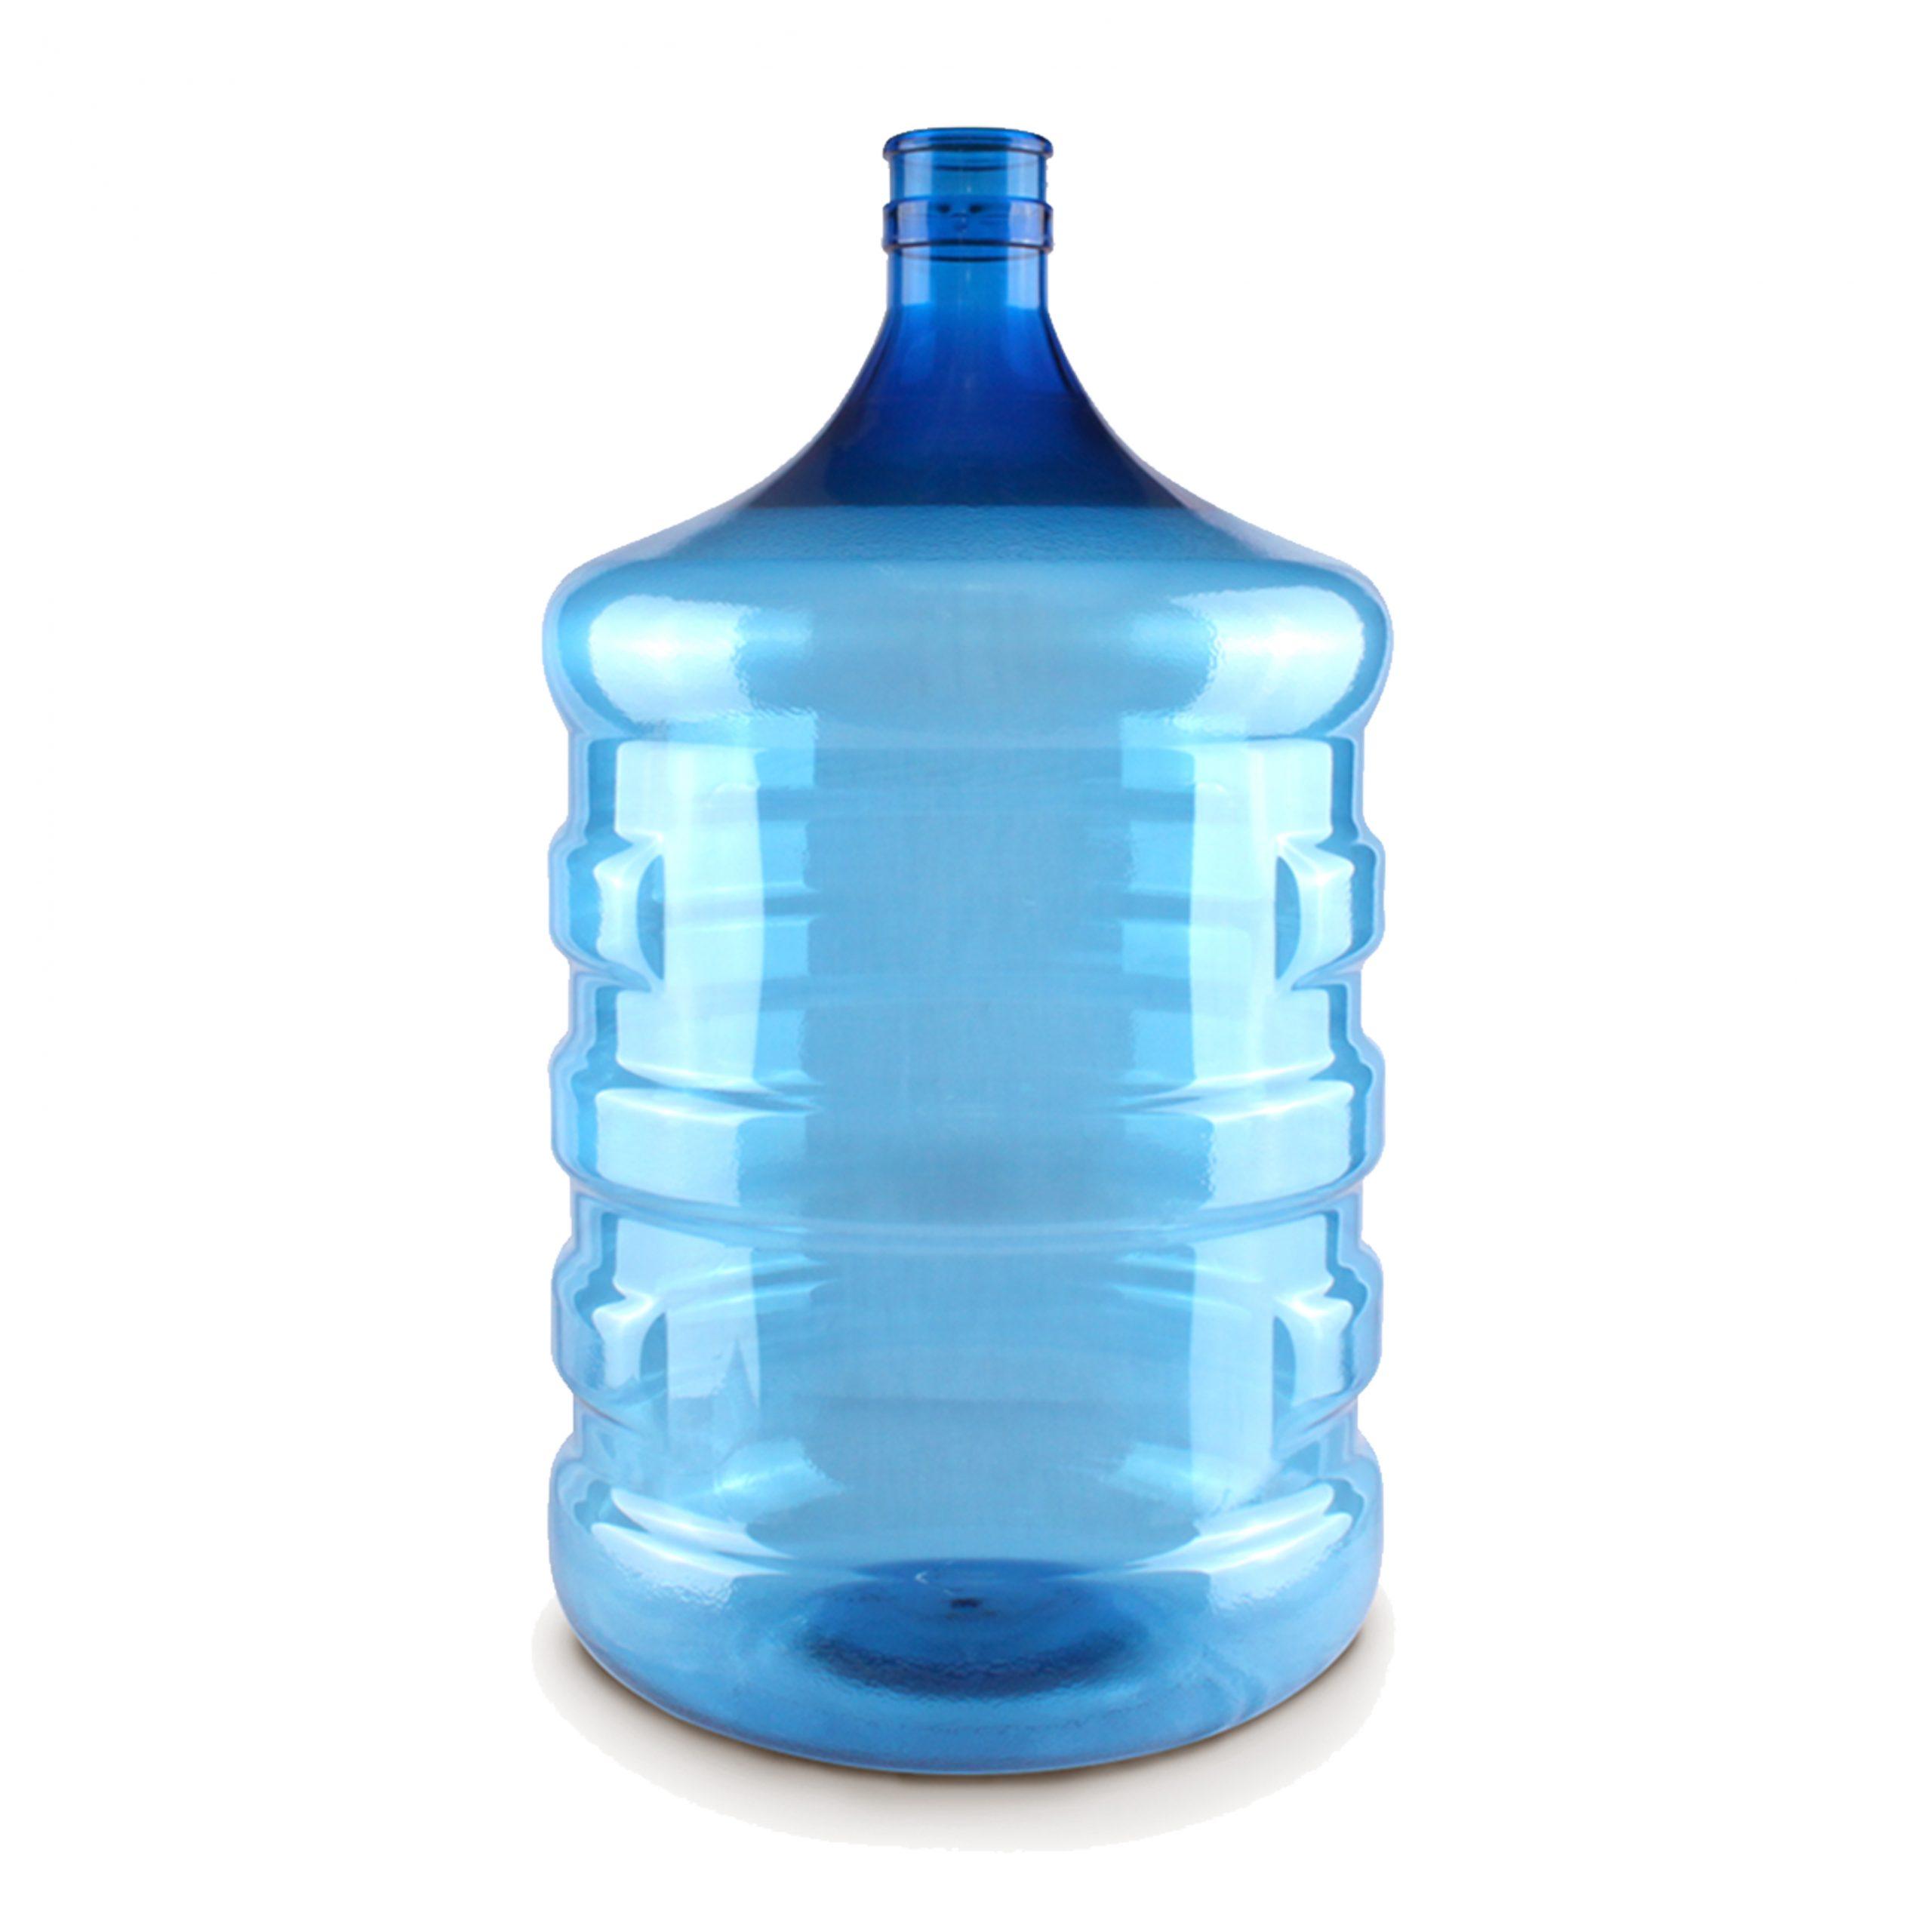 Jual Galon Air 19 Liter Biru PET